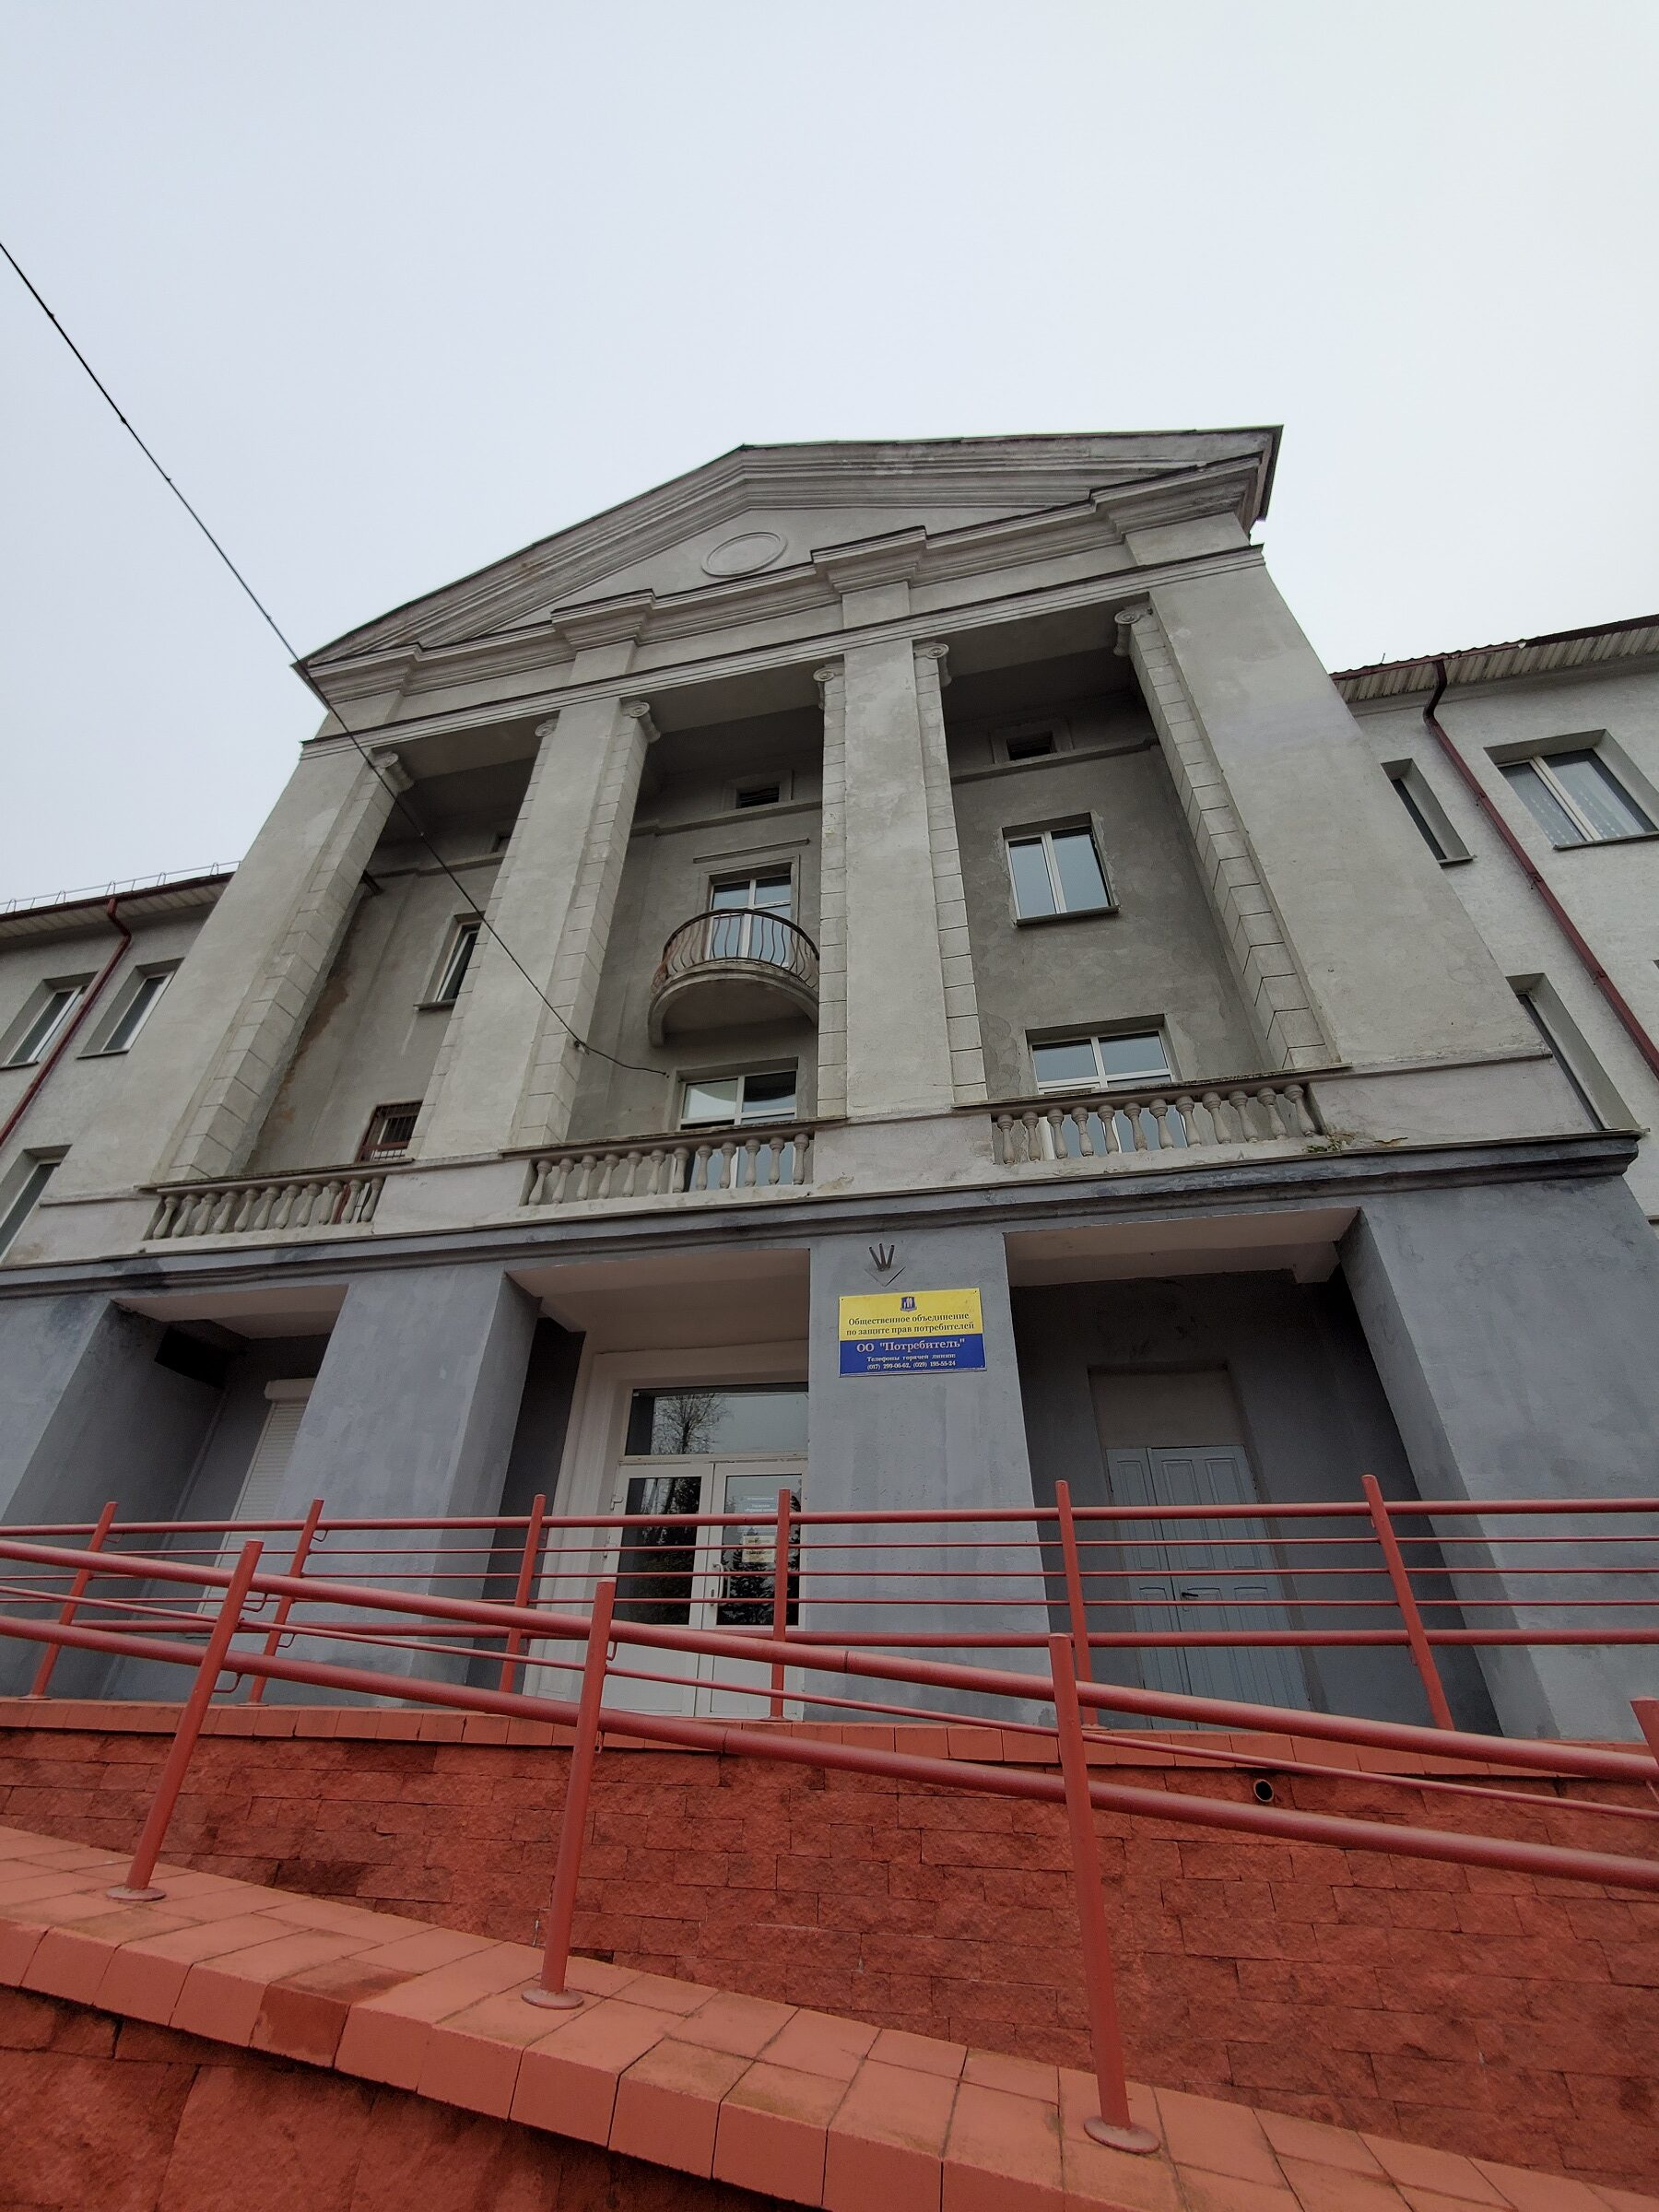 20201107 150435 rotated - Минск. Тракторозаводской поселок